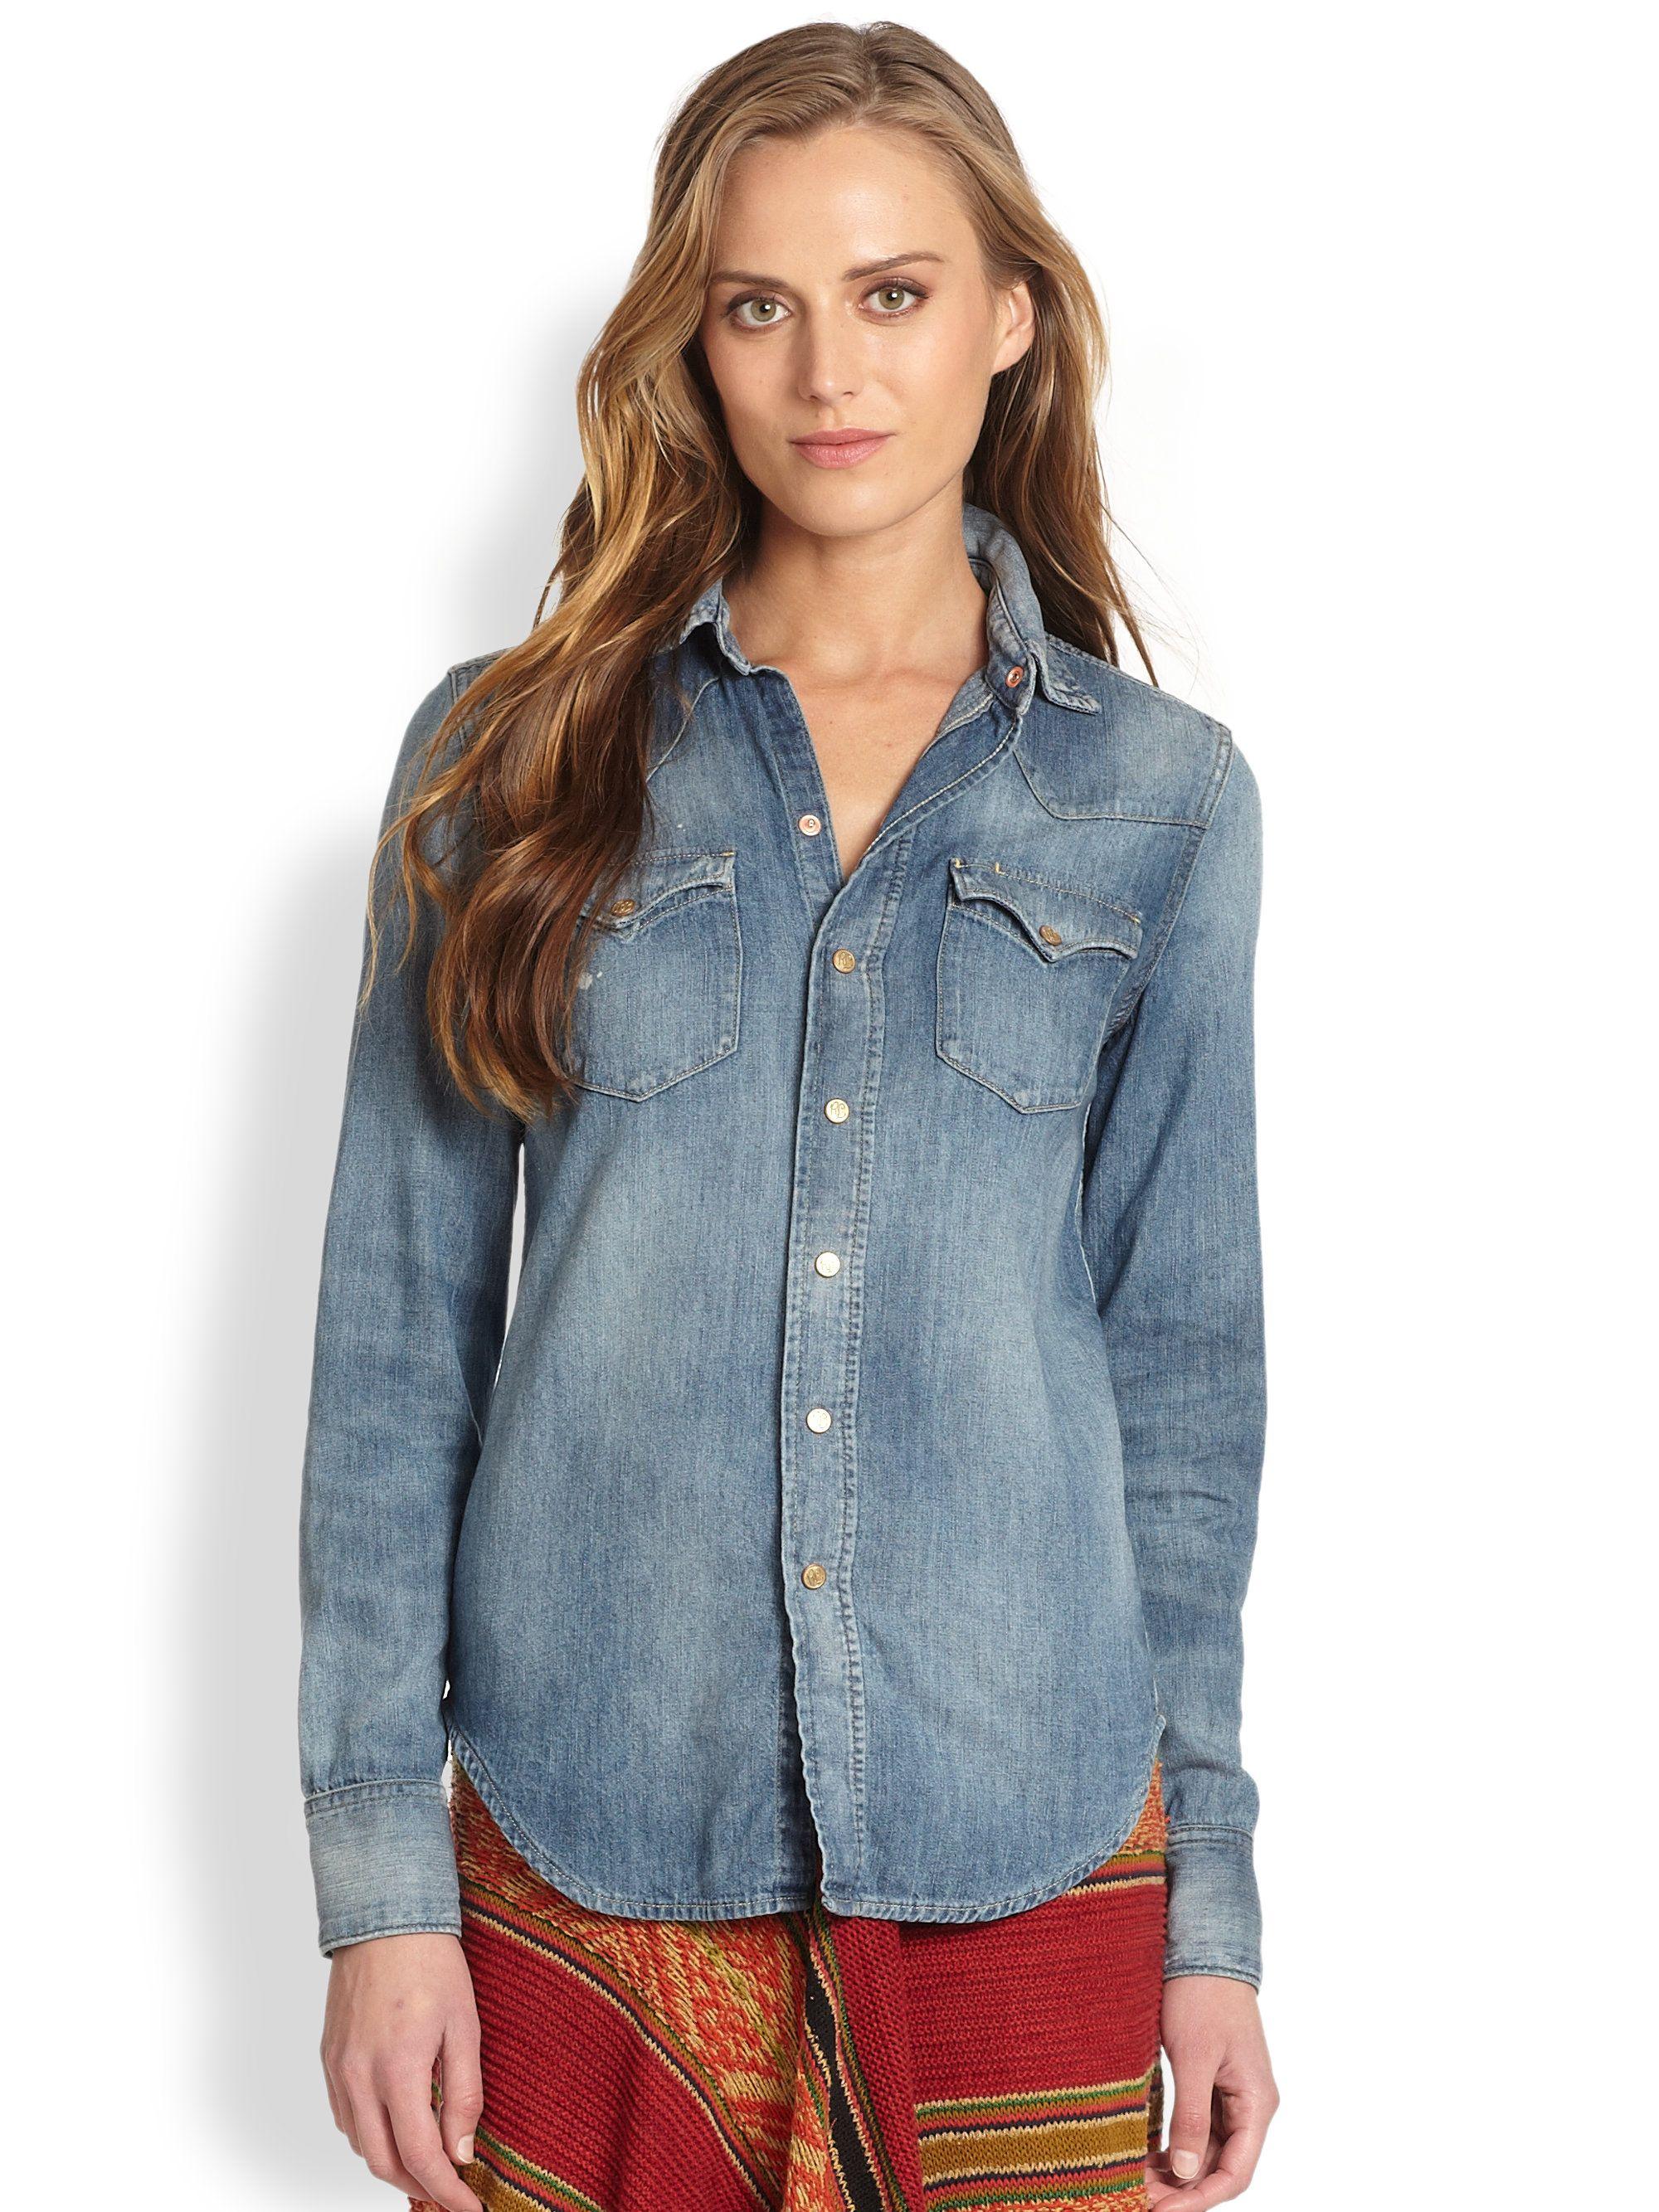 a4dc9b2dcf2ecf Ralph Lauren Blue Label Bradwell Wash Western Chambray Shirt ...